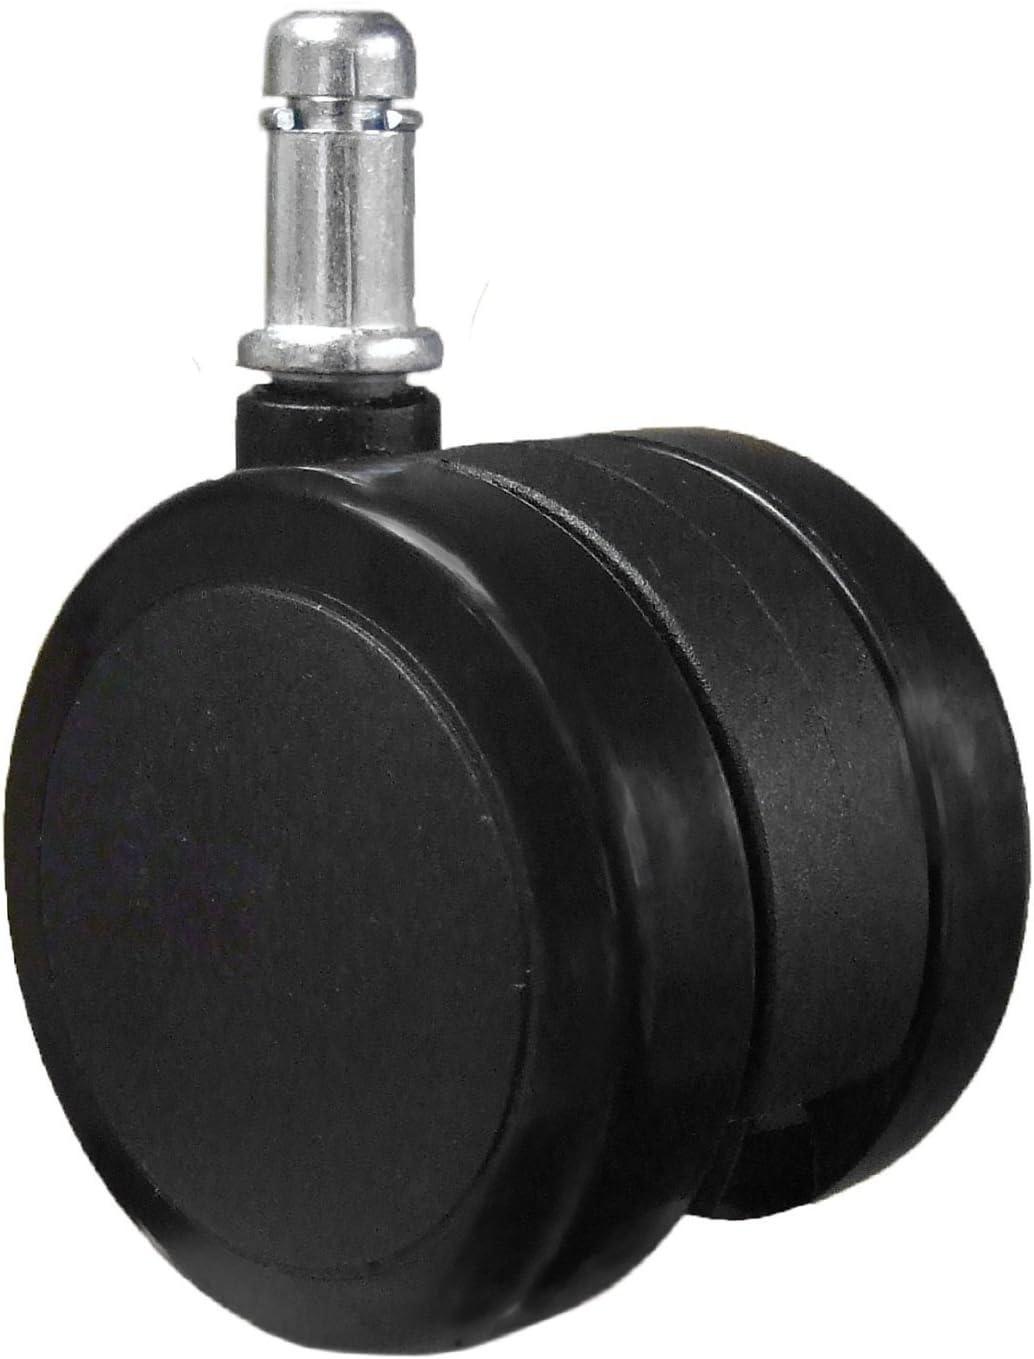 chairpartsonline Herman Miller Aeron Soft Caster Wheel for Hardwood Floors 5 Casters